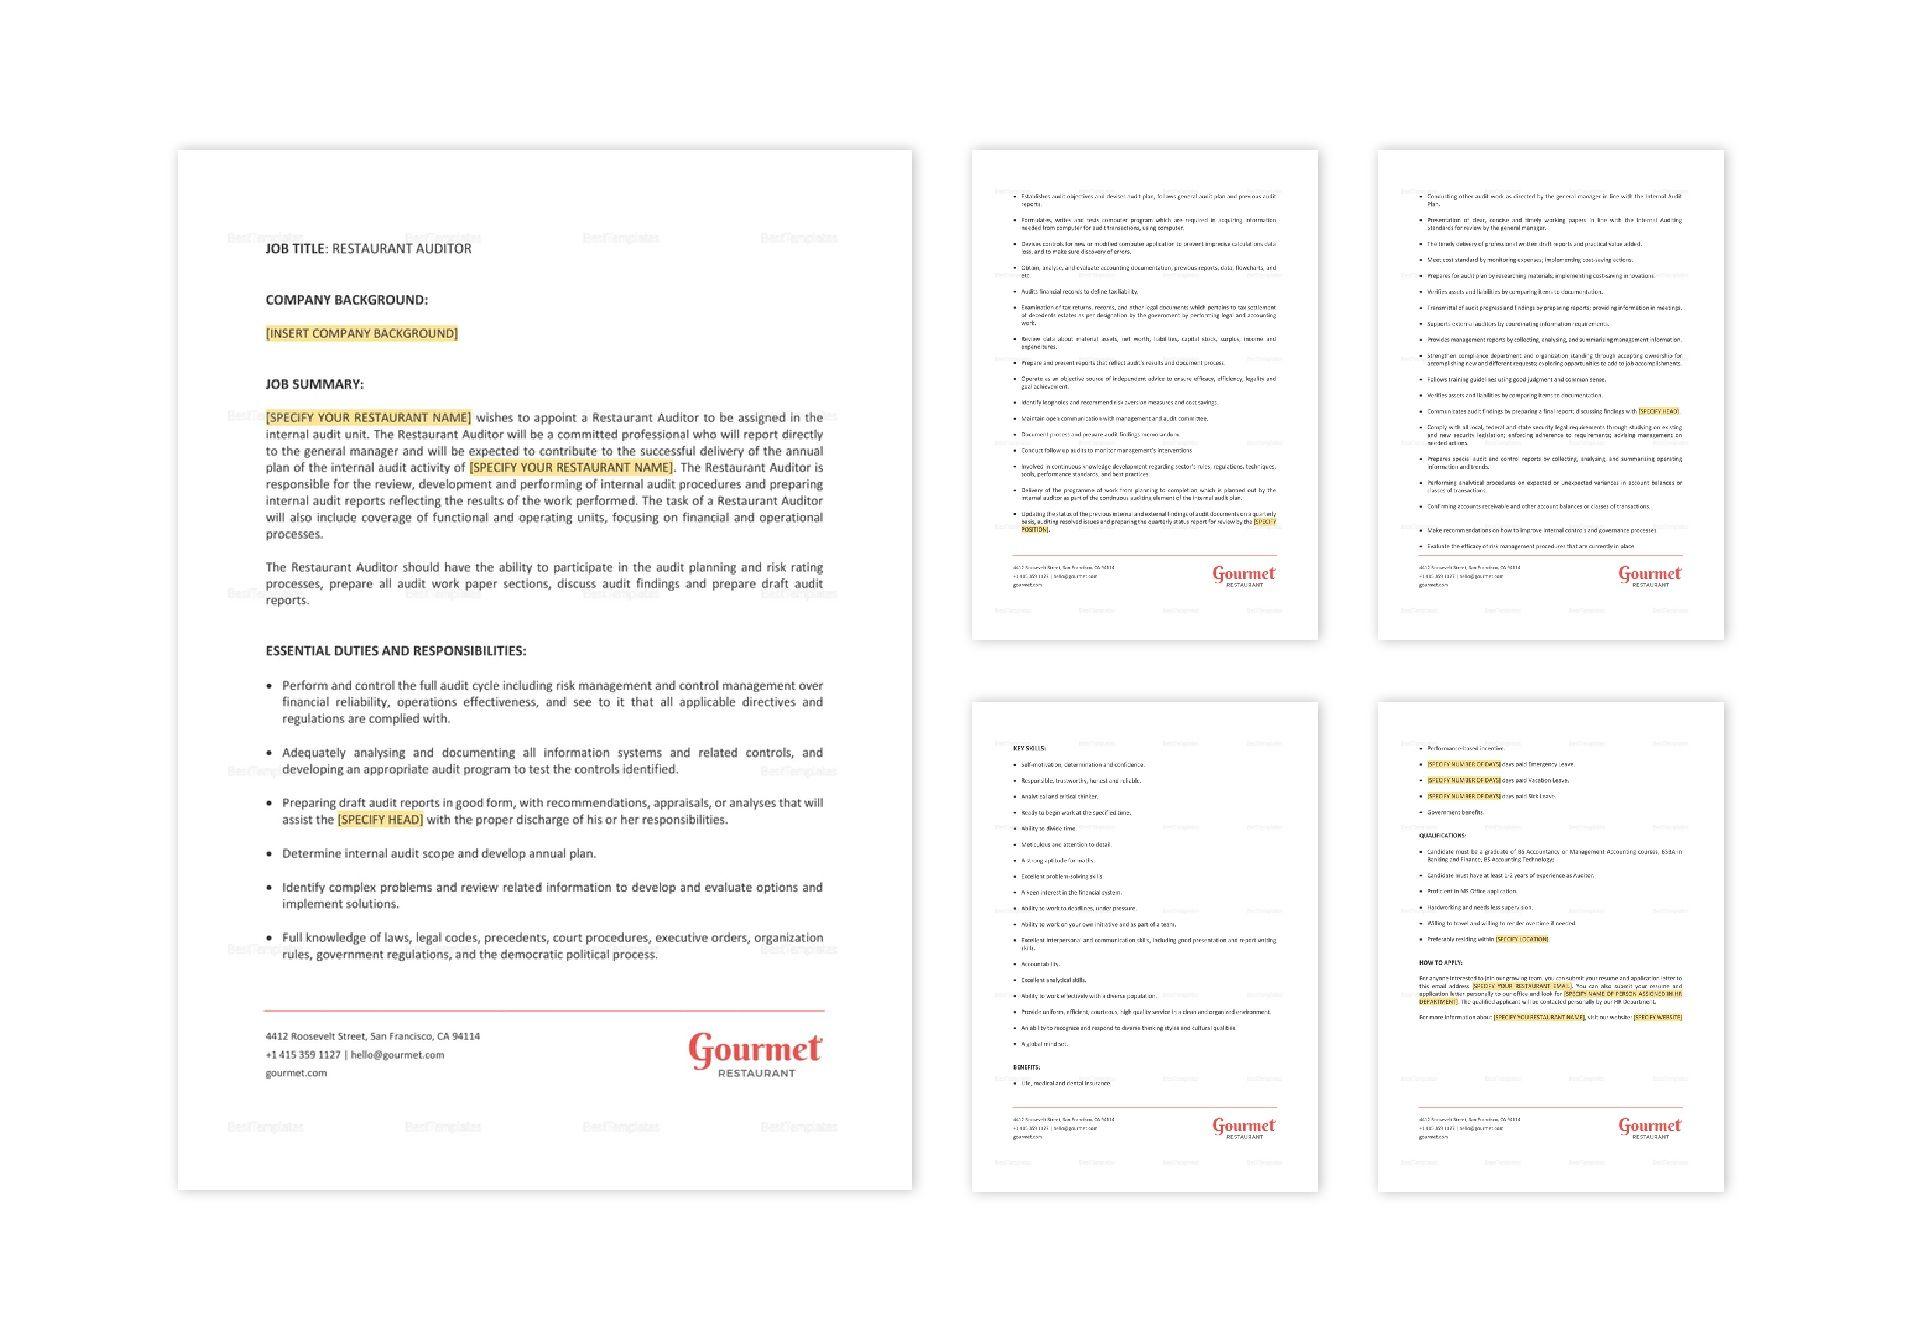 Restaurant Auditor Job Description Template in Word, Apple